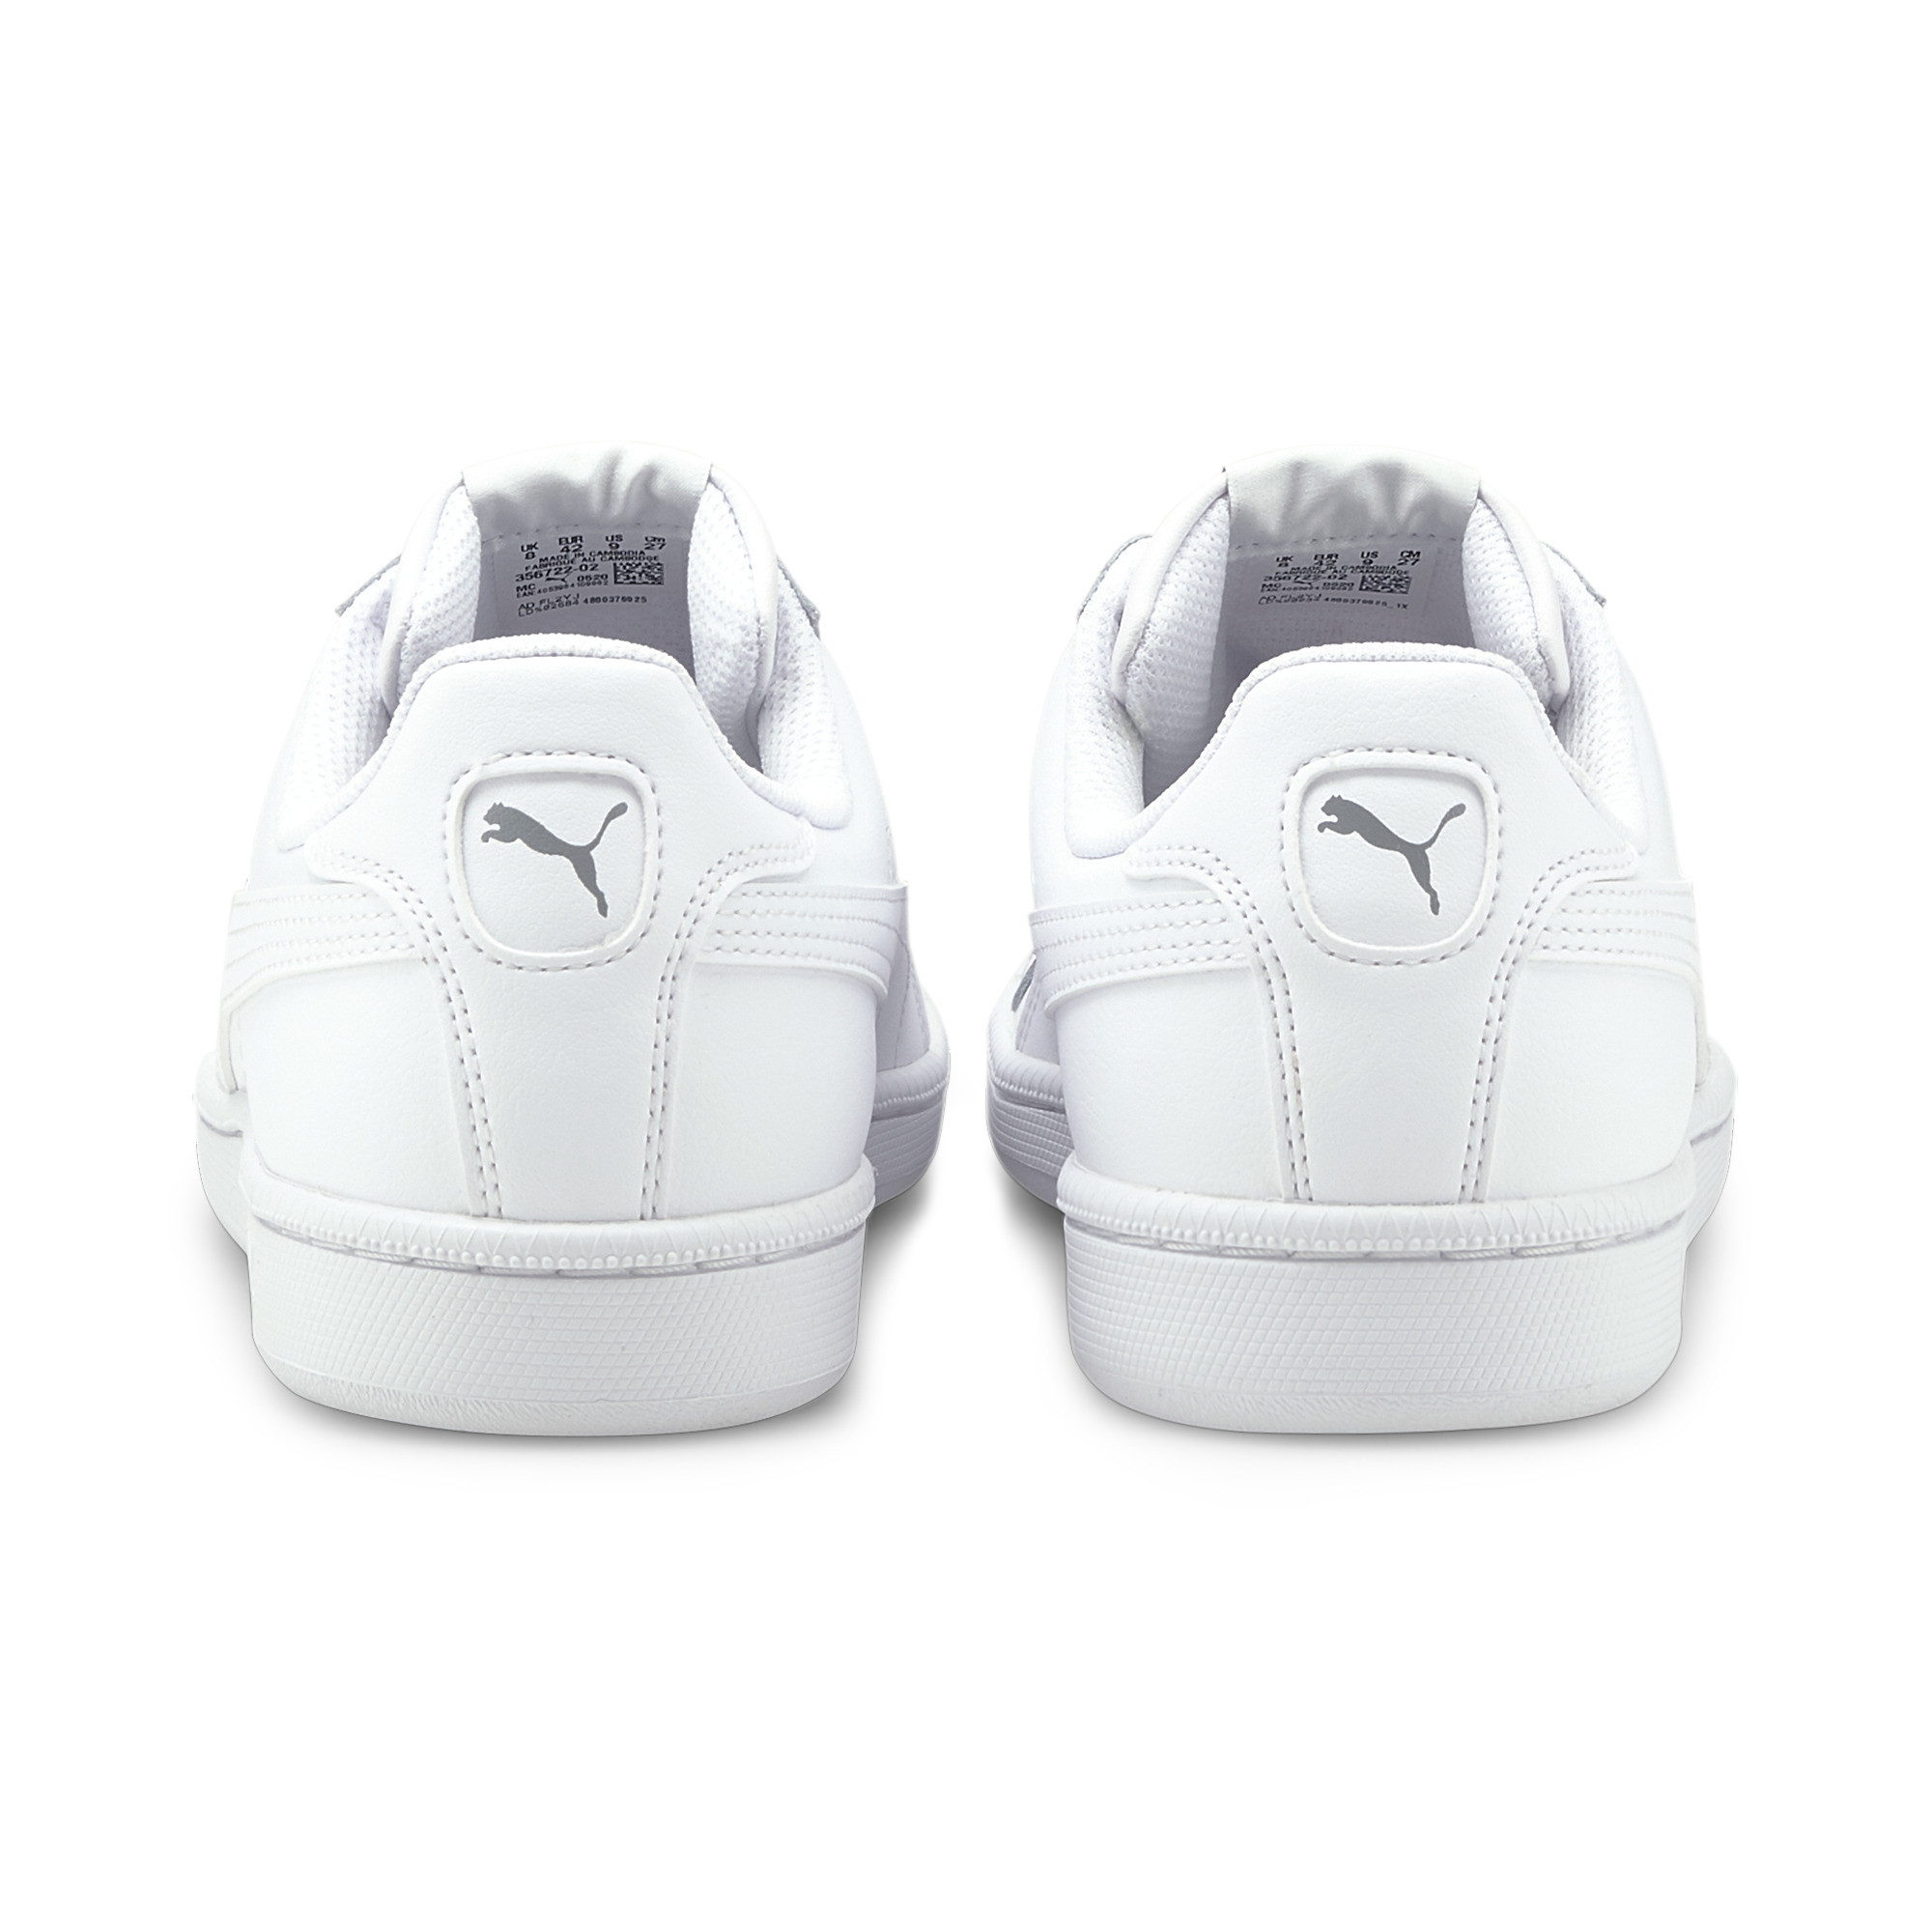 Indexbild 18 - PUMA Smash Trainers Schuhe Sneakers Sport Classics Unisex Neu